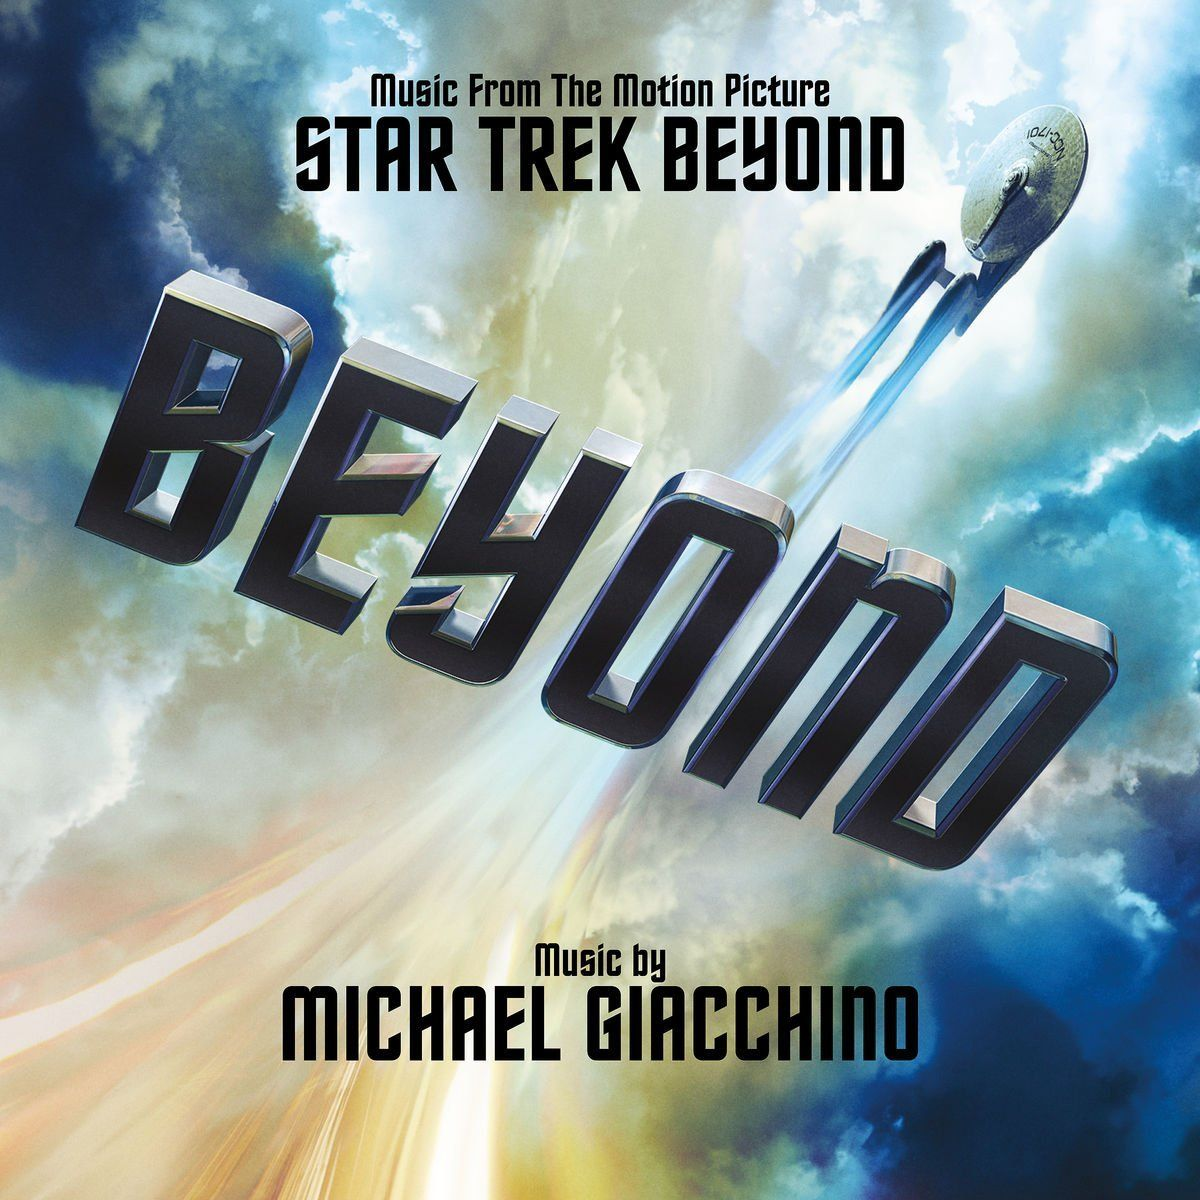 Star Trek Beyond Soundtrack by Michael Giacchino